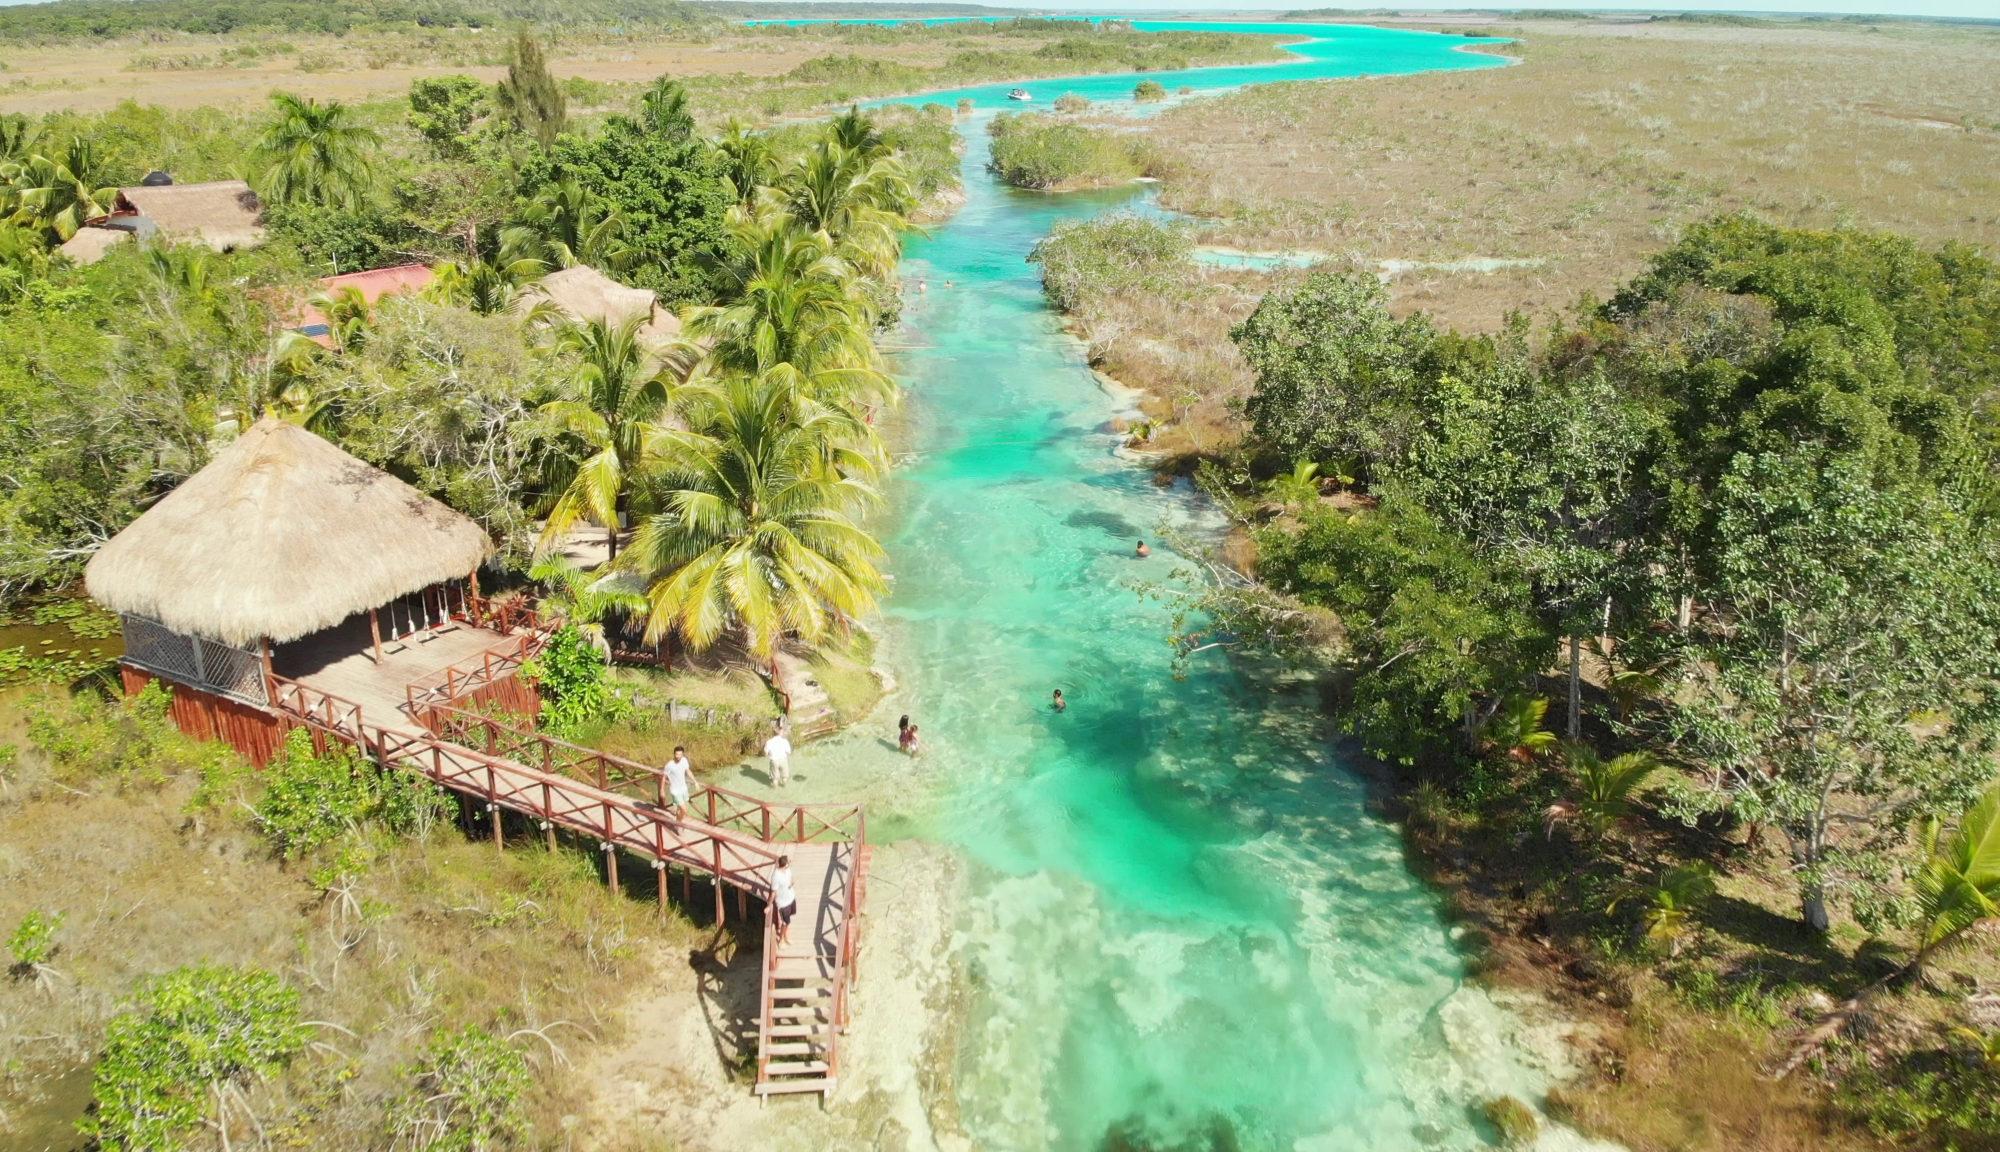 Bacalar Lagoon, Mexico - Most Beautiful Lake On Earth |Lake Bacalar Mexico